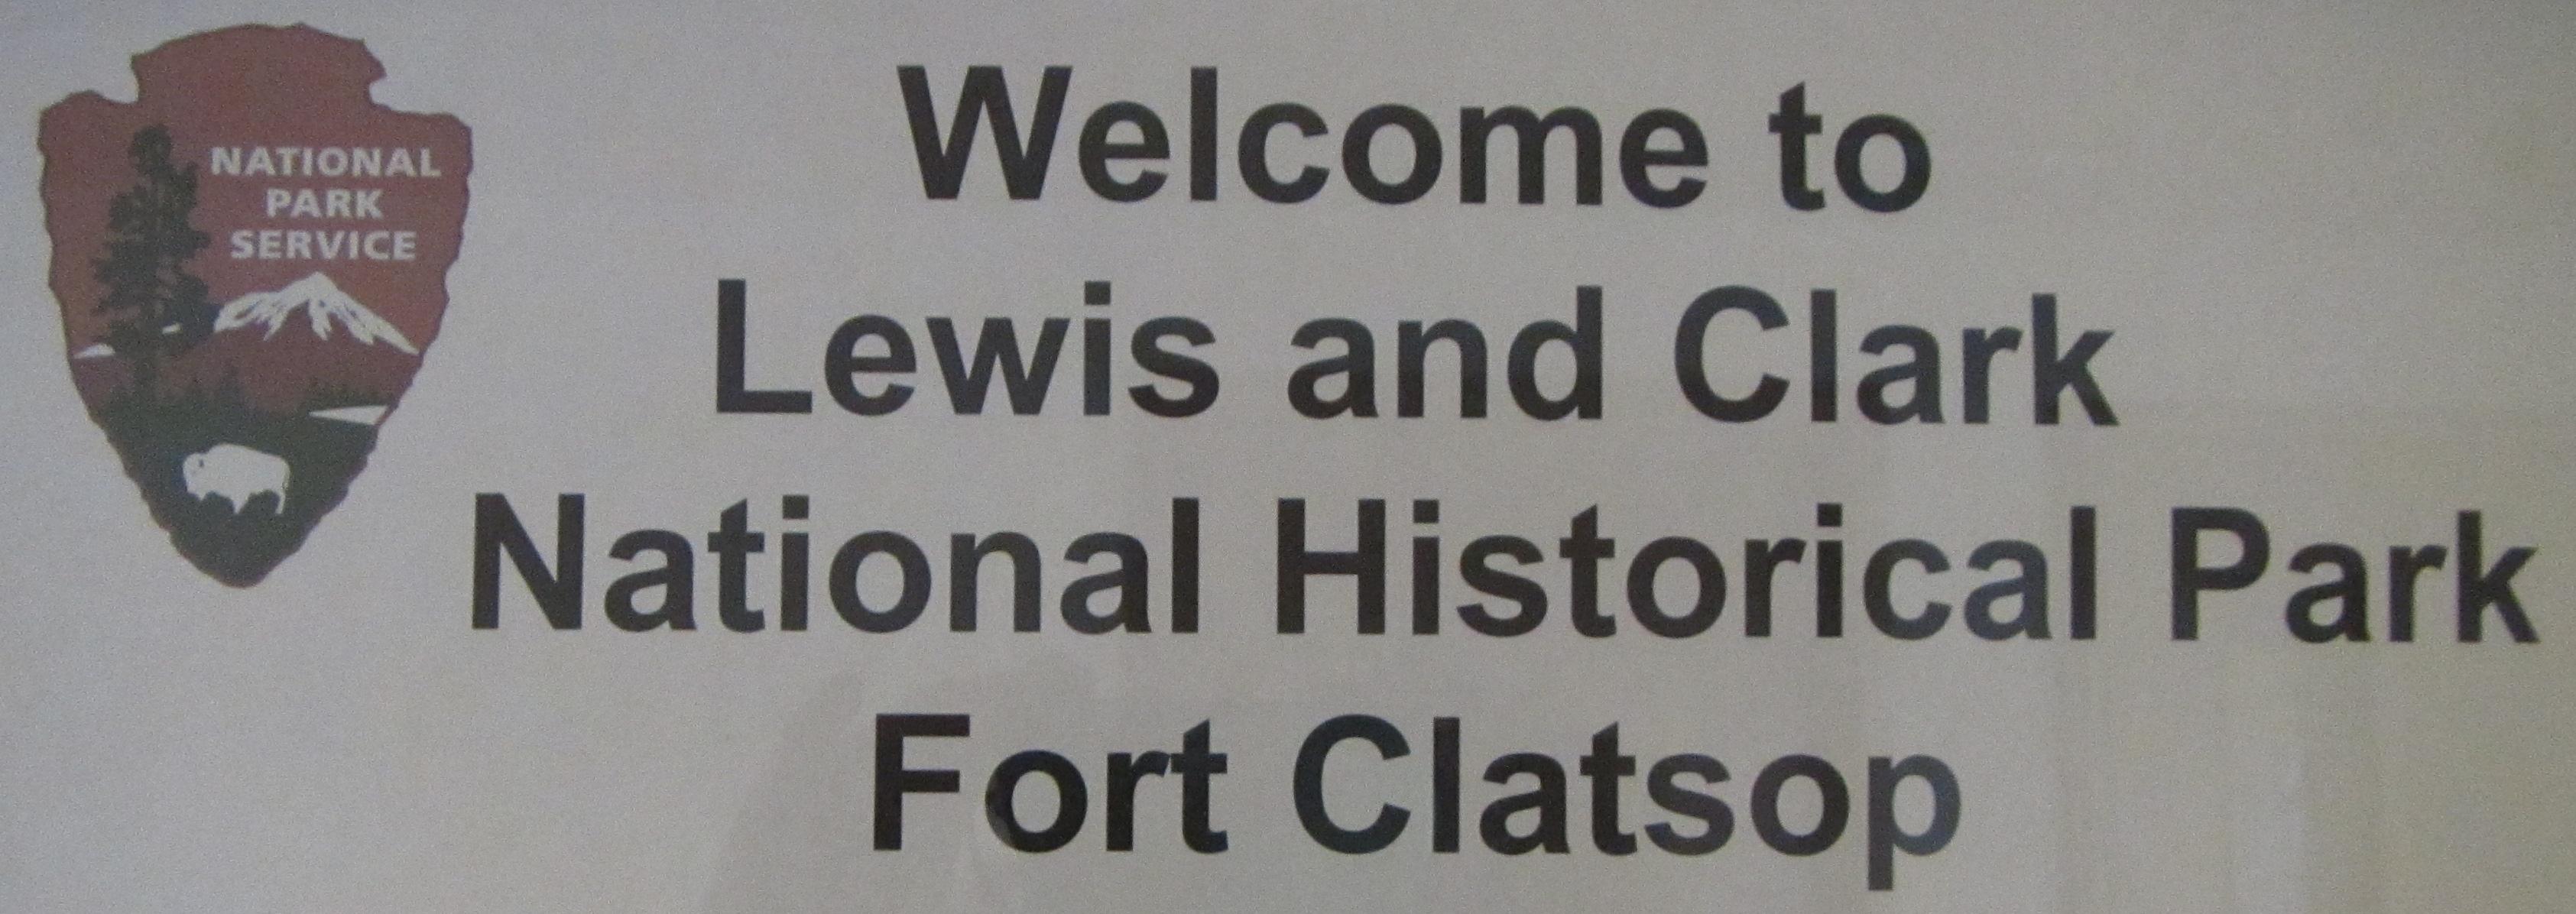 Oregon S Fort Clatsop At Lewis Amp Clark National Historical